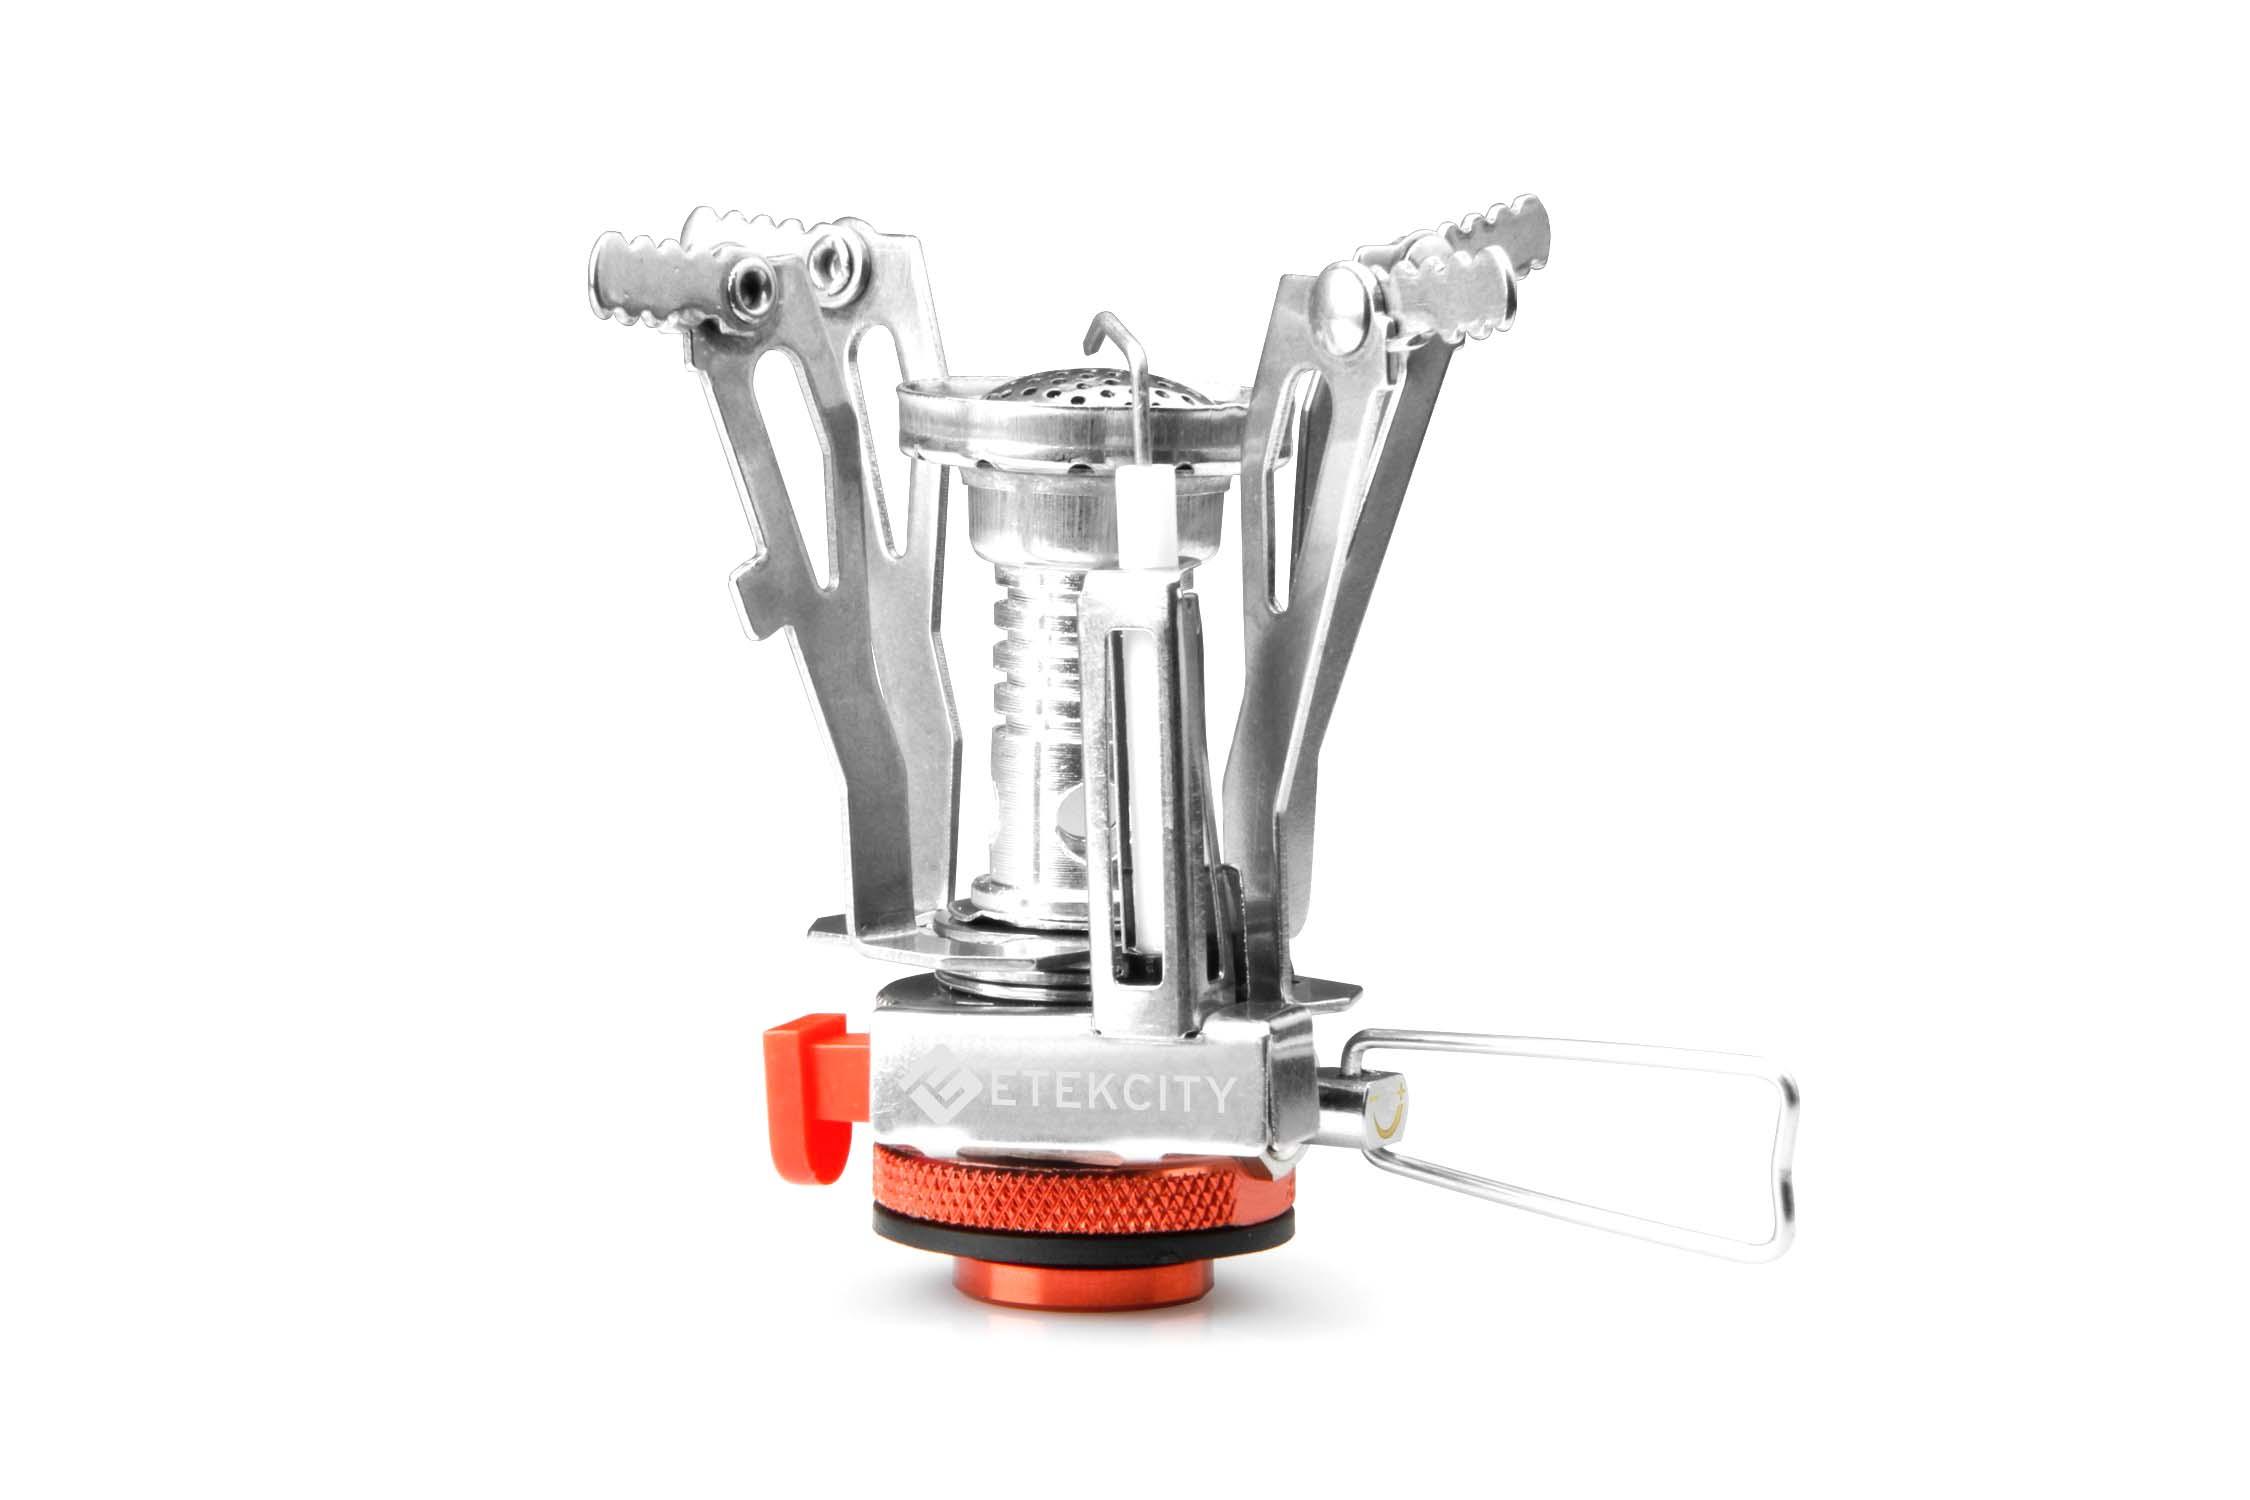 Ultra Compact Stove - 4.5 stars - $11 (Prime)